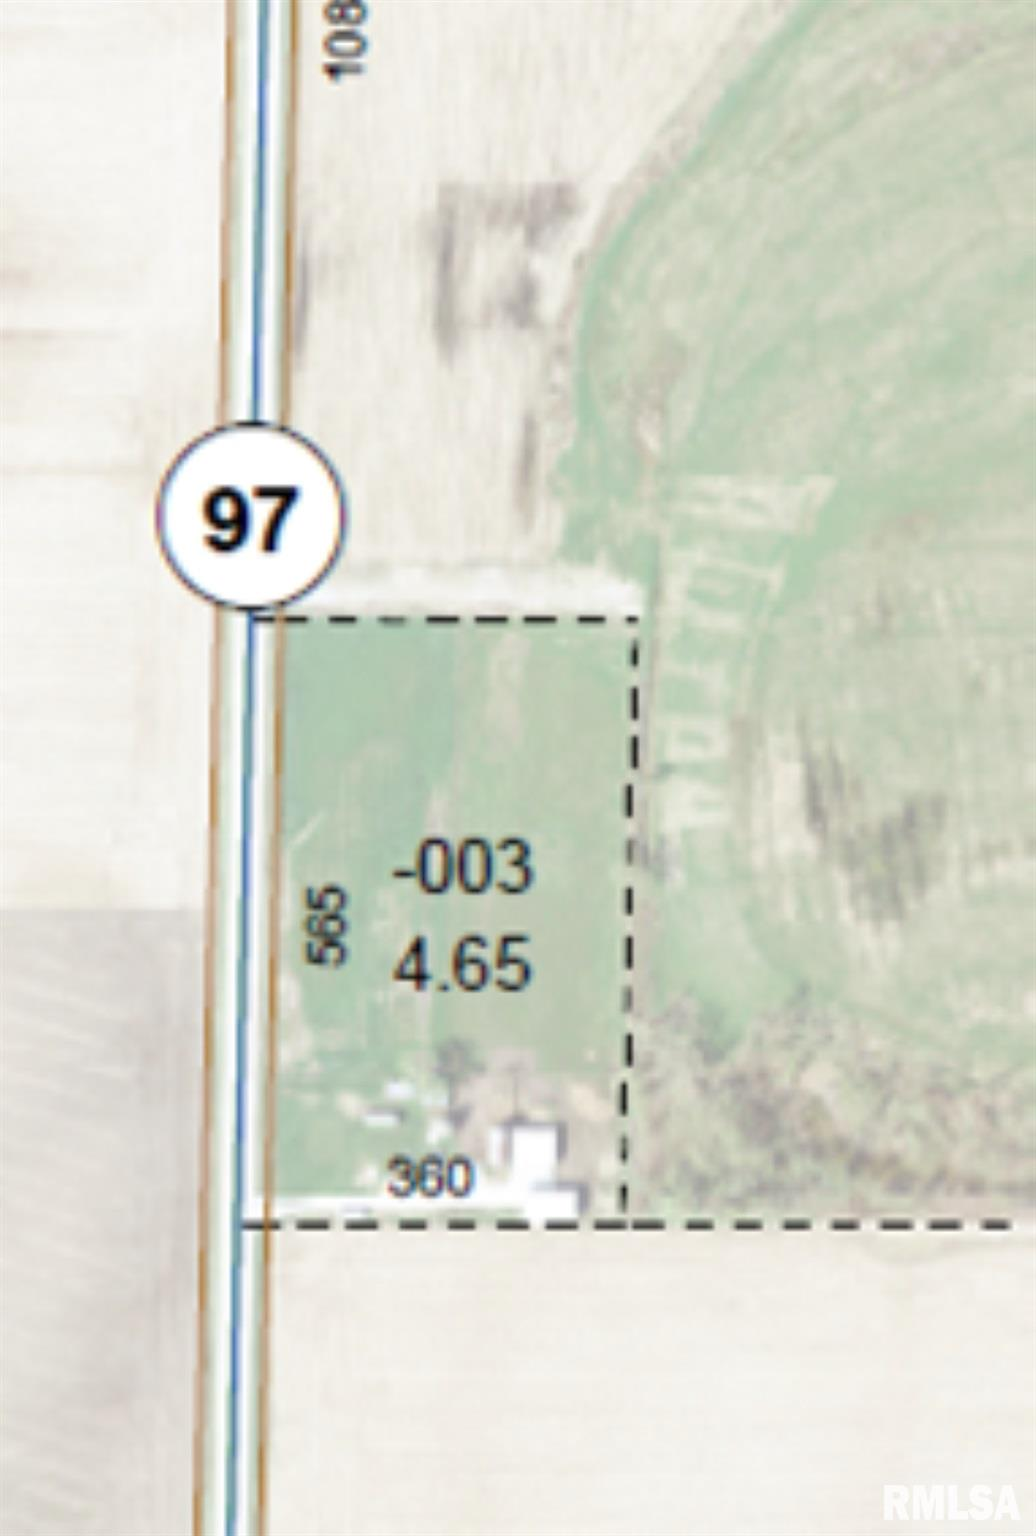 24691 N IL HWY 97 Property Photo - Cuba, IL real estate listing